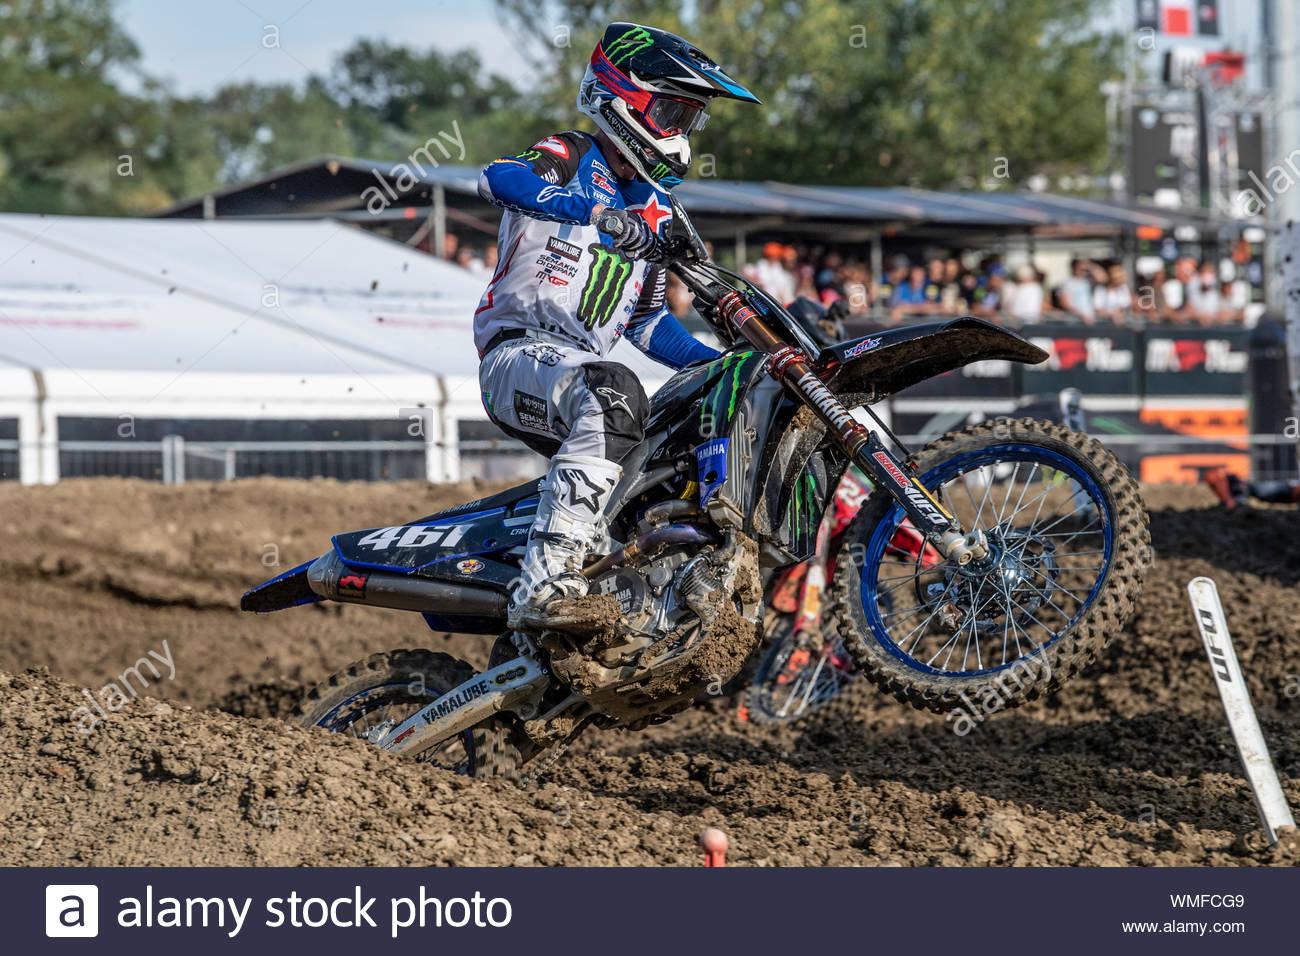 romain febvre, imola, motocross mxgp, gran premio d'italia, imola bologna 17-08-2019 Stock Photo